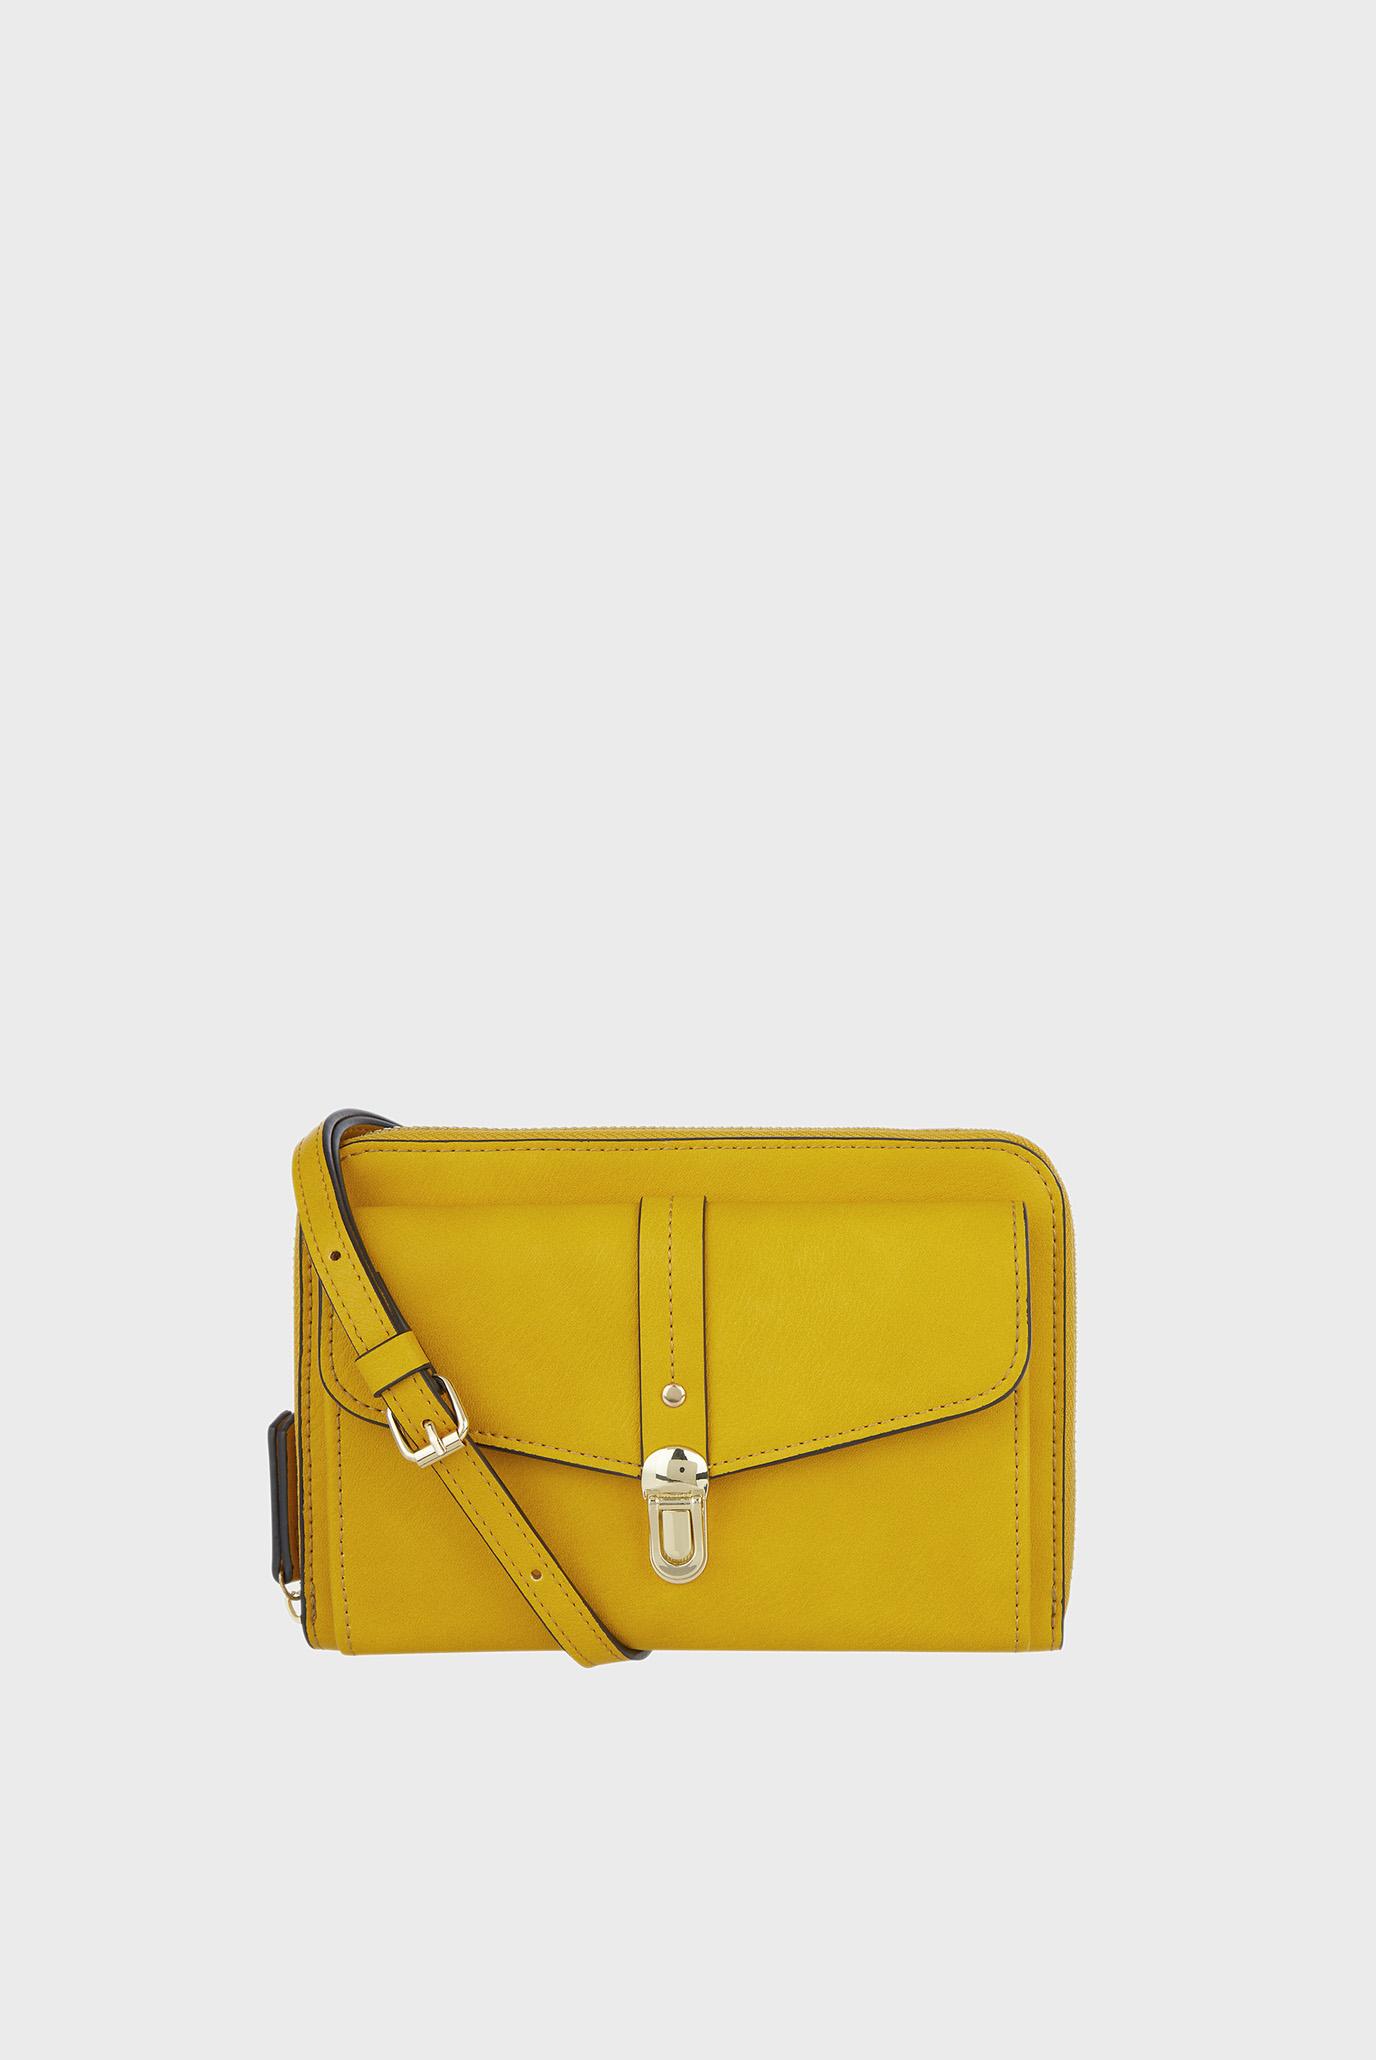 37709f6d7da Купить Женская желтая сумка через плечо Accessorize Accessorize ...